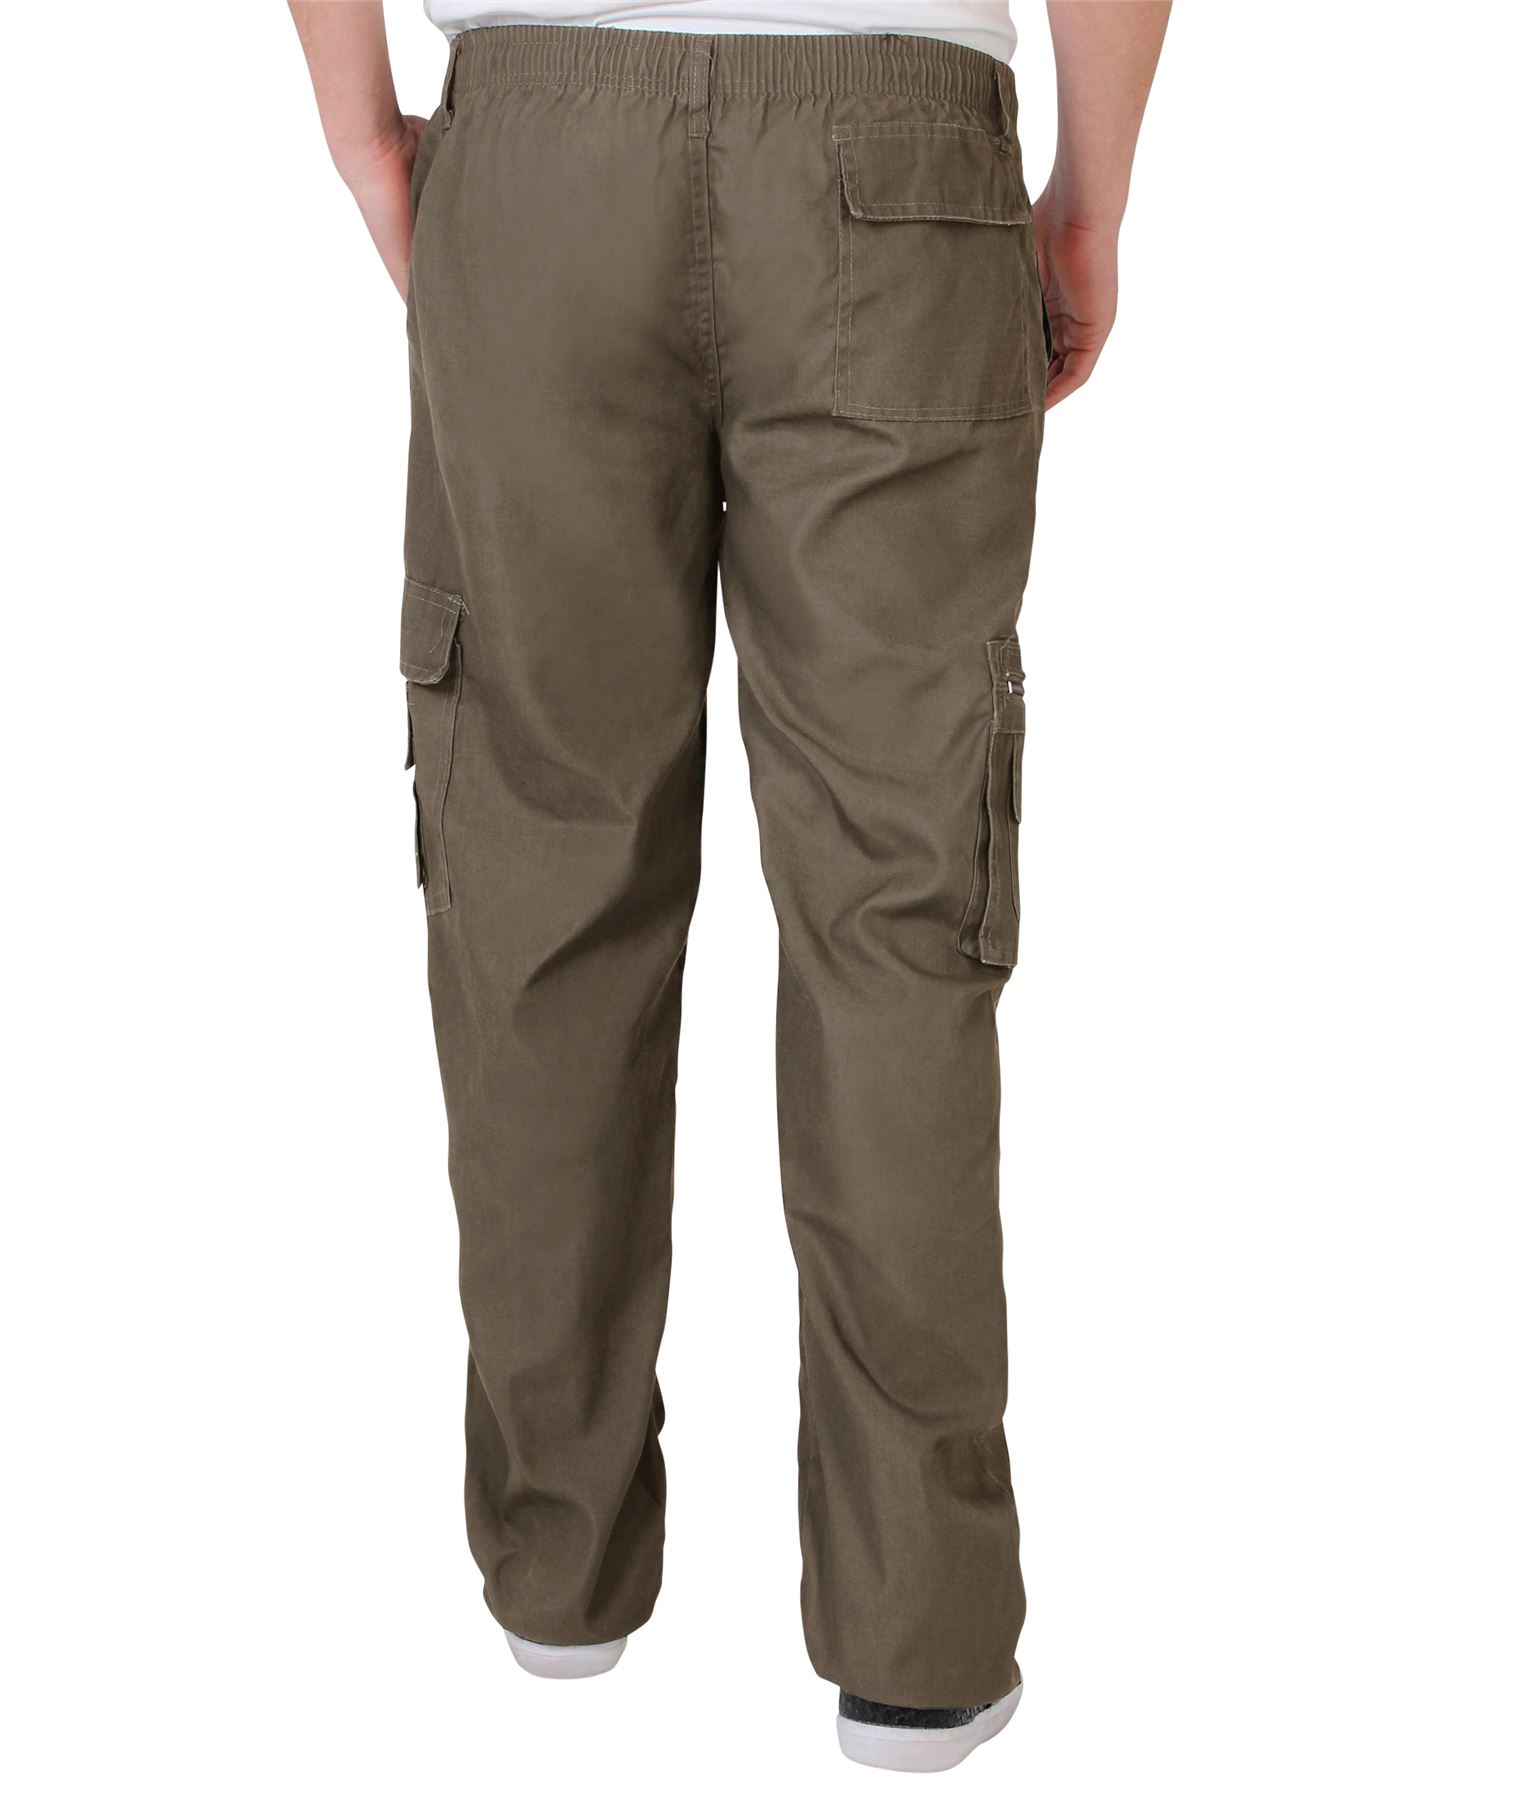 Pantalones-Hombre-Estilo-Cargo-Militar-Combate-Multibolsillos-Casual miniatura 34